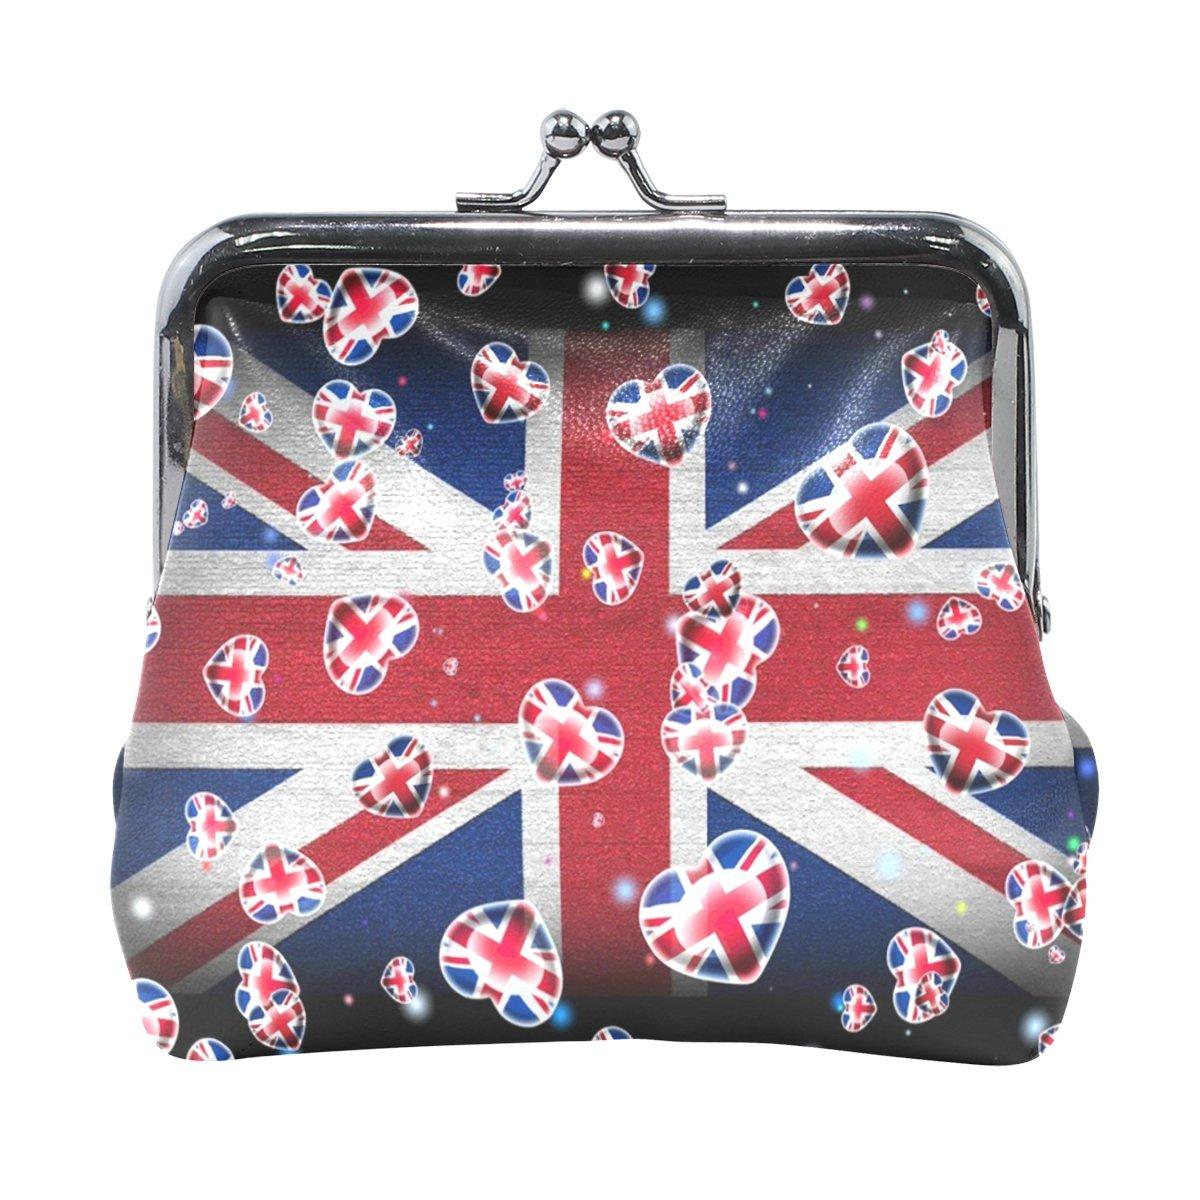 MaMacool British Flag Coin Pouch Purse Womens Wallet Card Holder Coin Purse Clutch Handbag by MaMacool